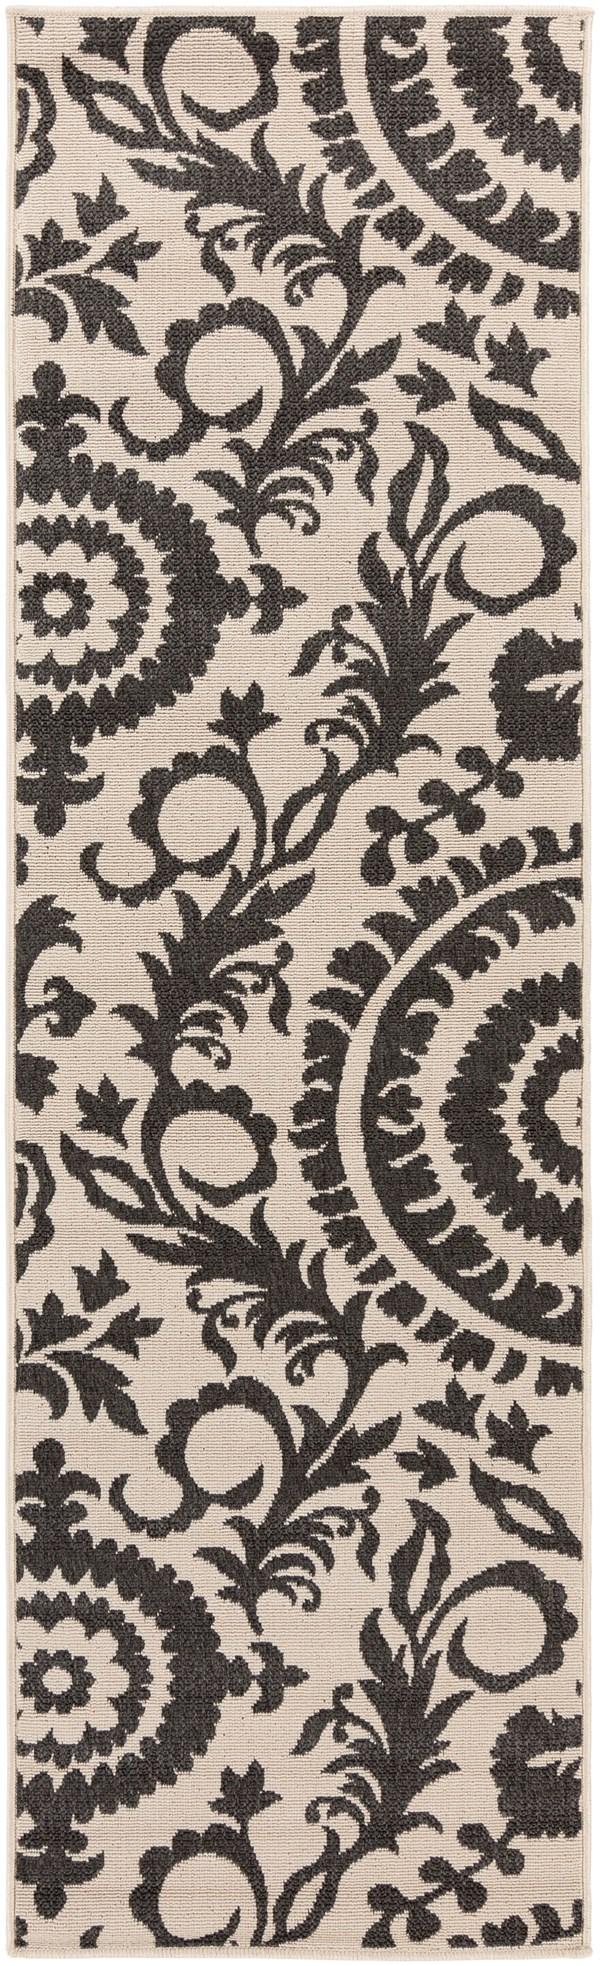 Black, Khaki Transitional Area Rug